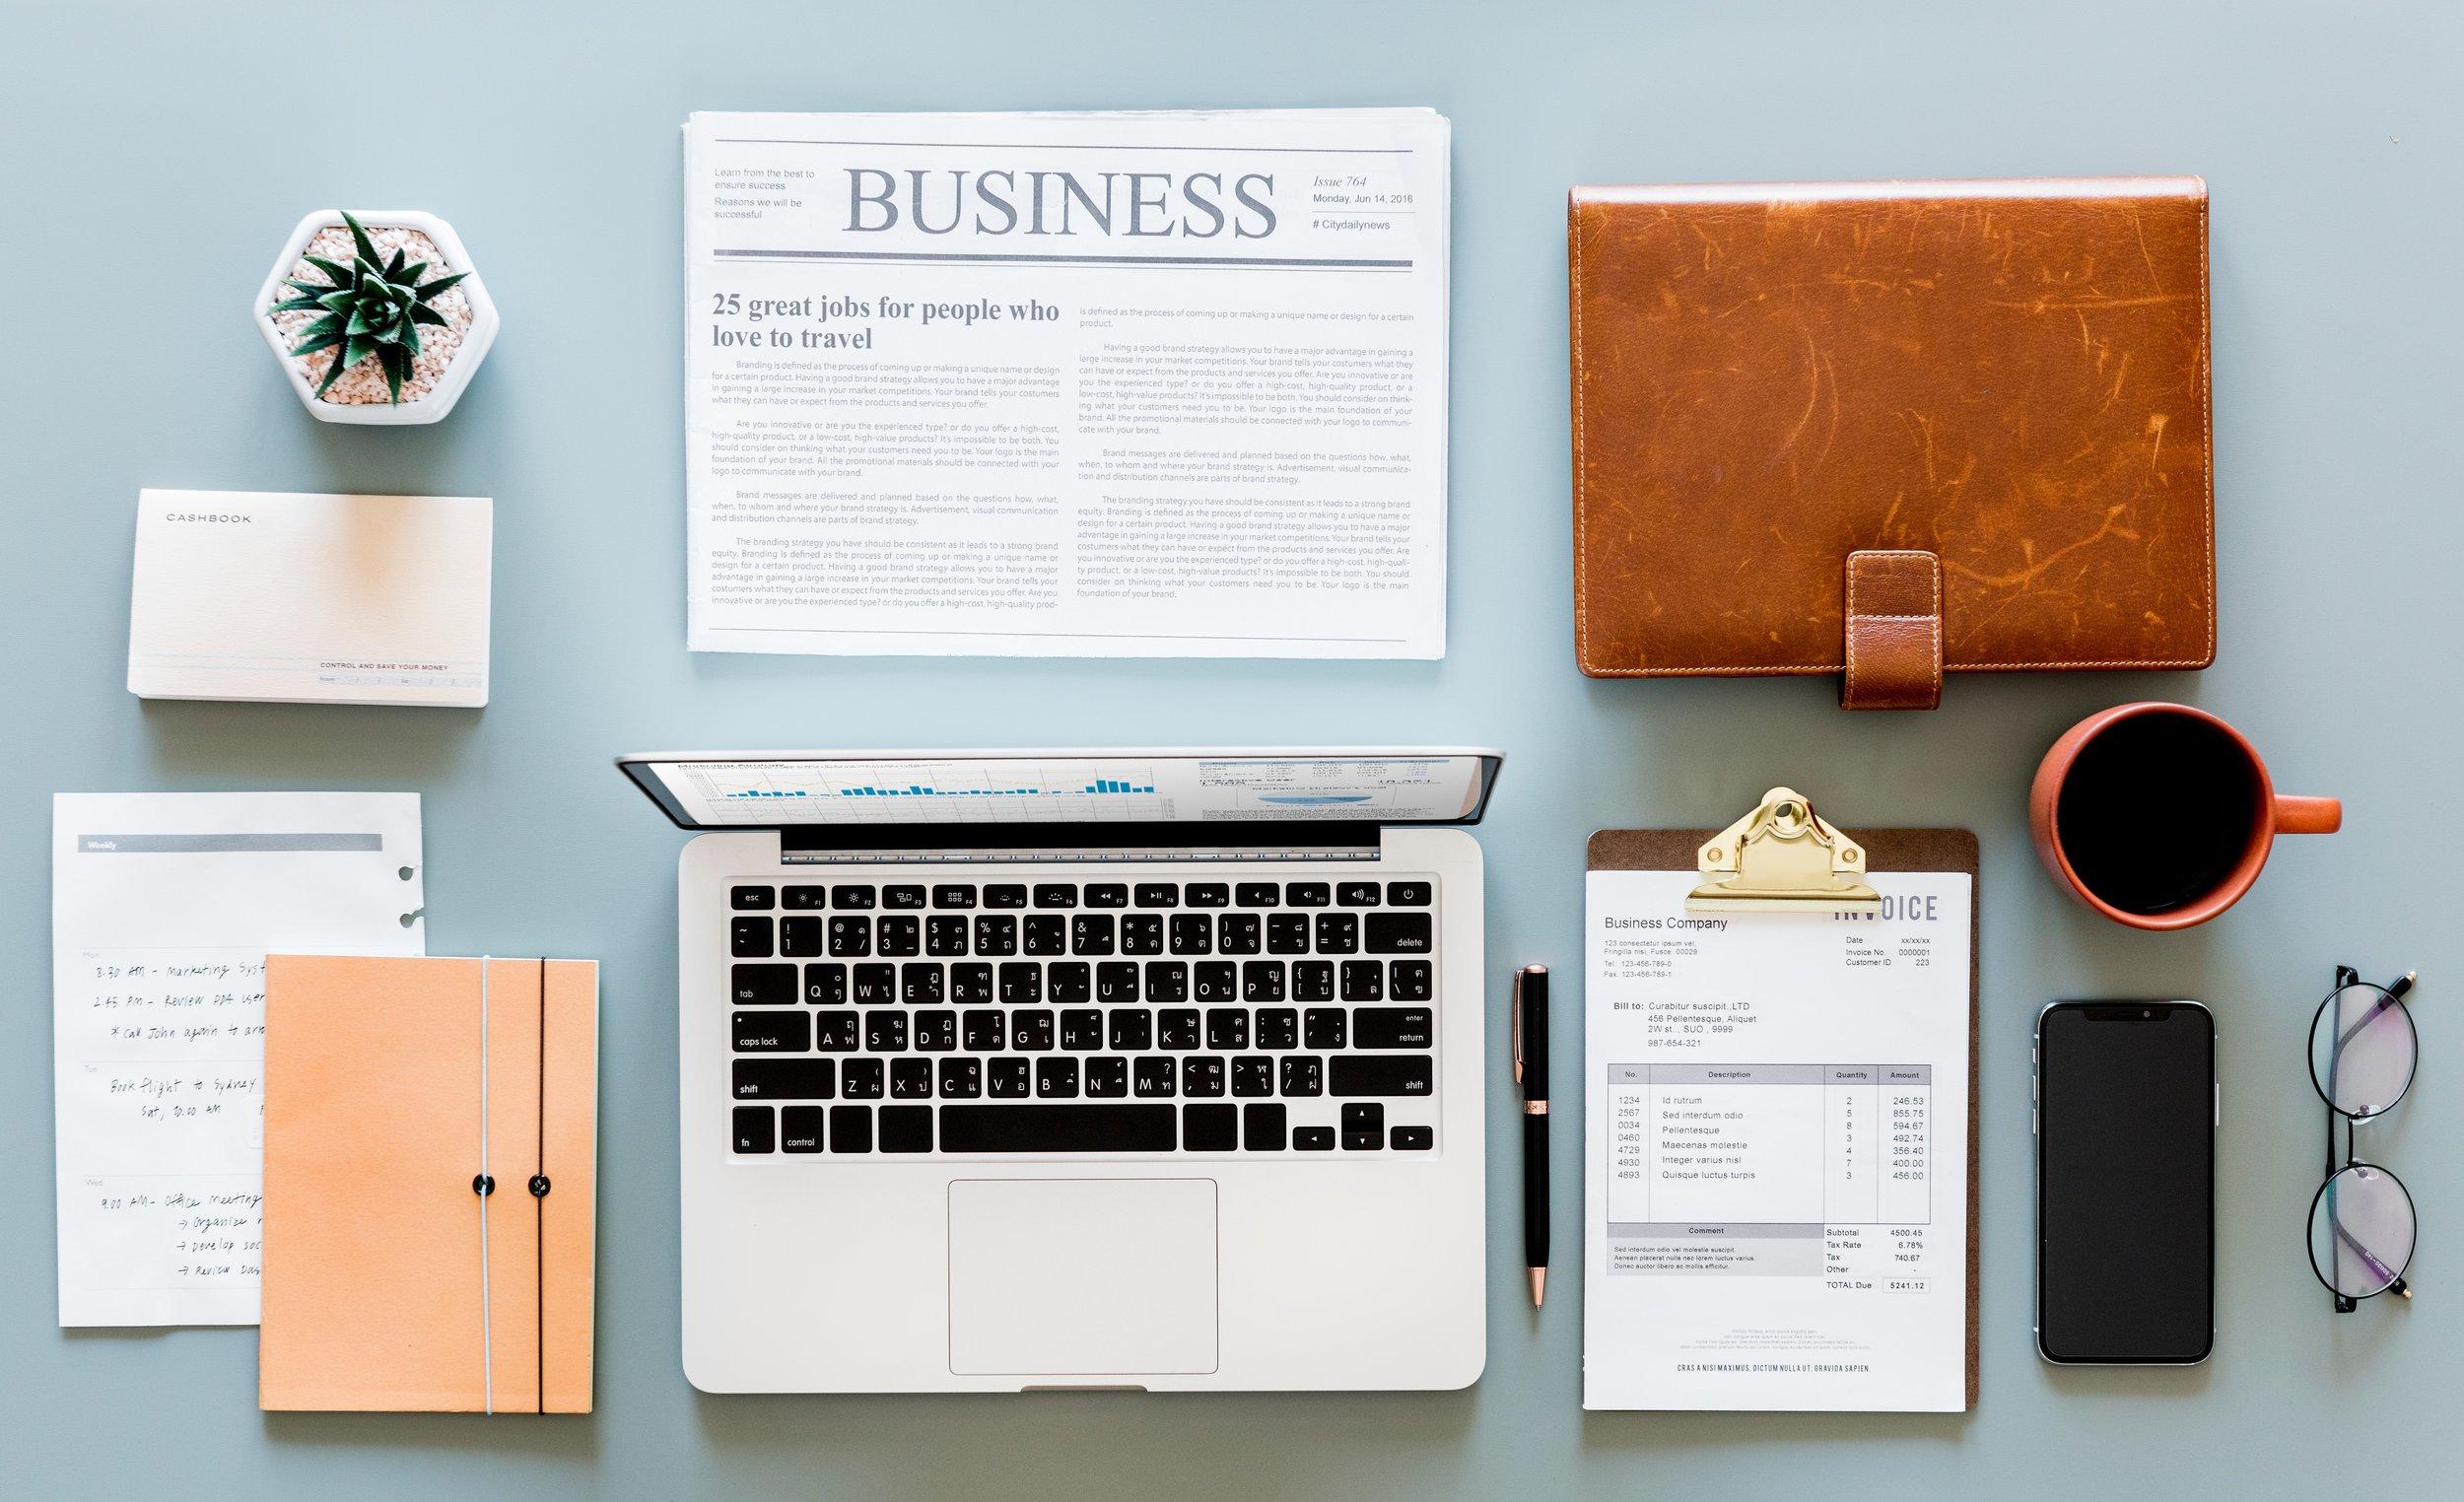 Curated Financial Services - Here is a description of what makes your company unique. Pellentesque habitant ulcit mori netus et malesuada netus et malesuada.